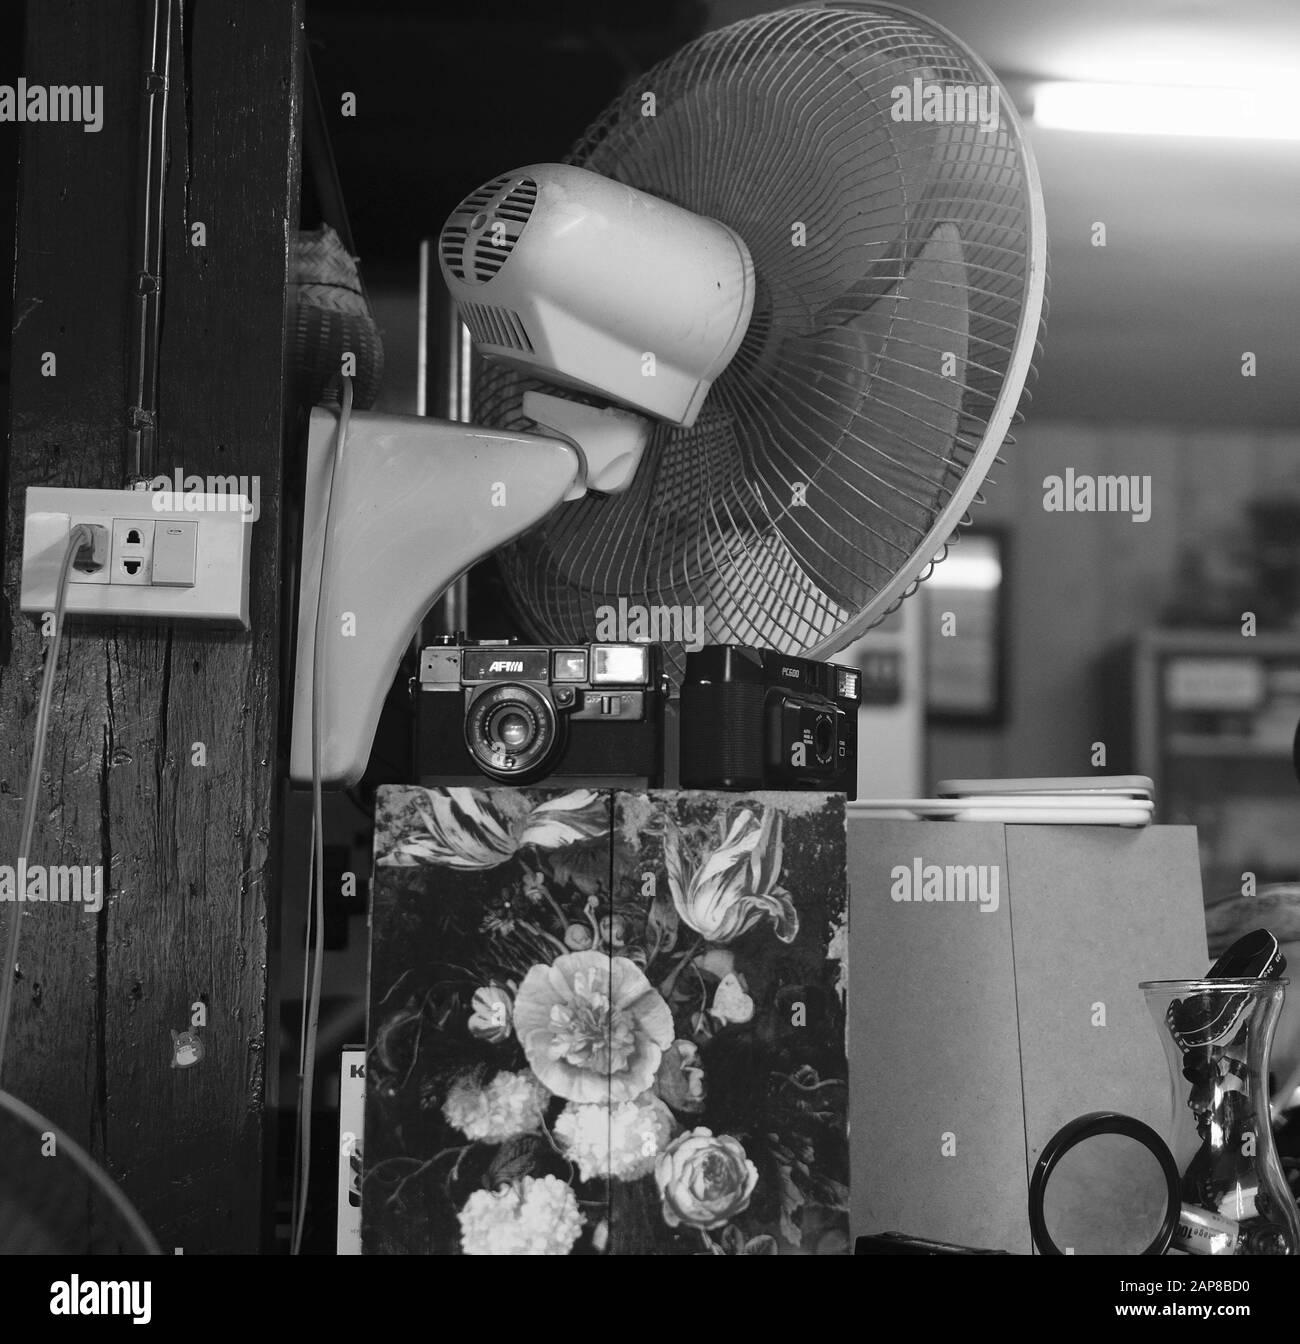 Vintage Cameras on Display Stock Photo